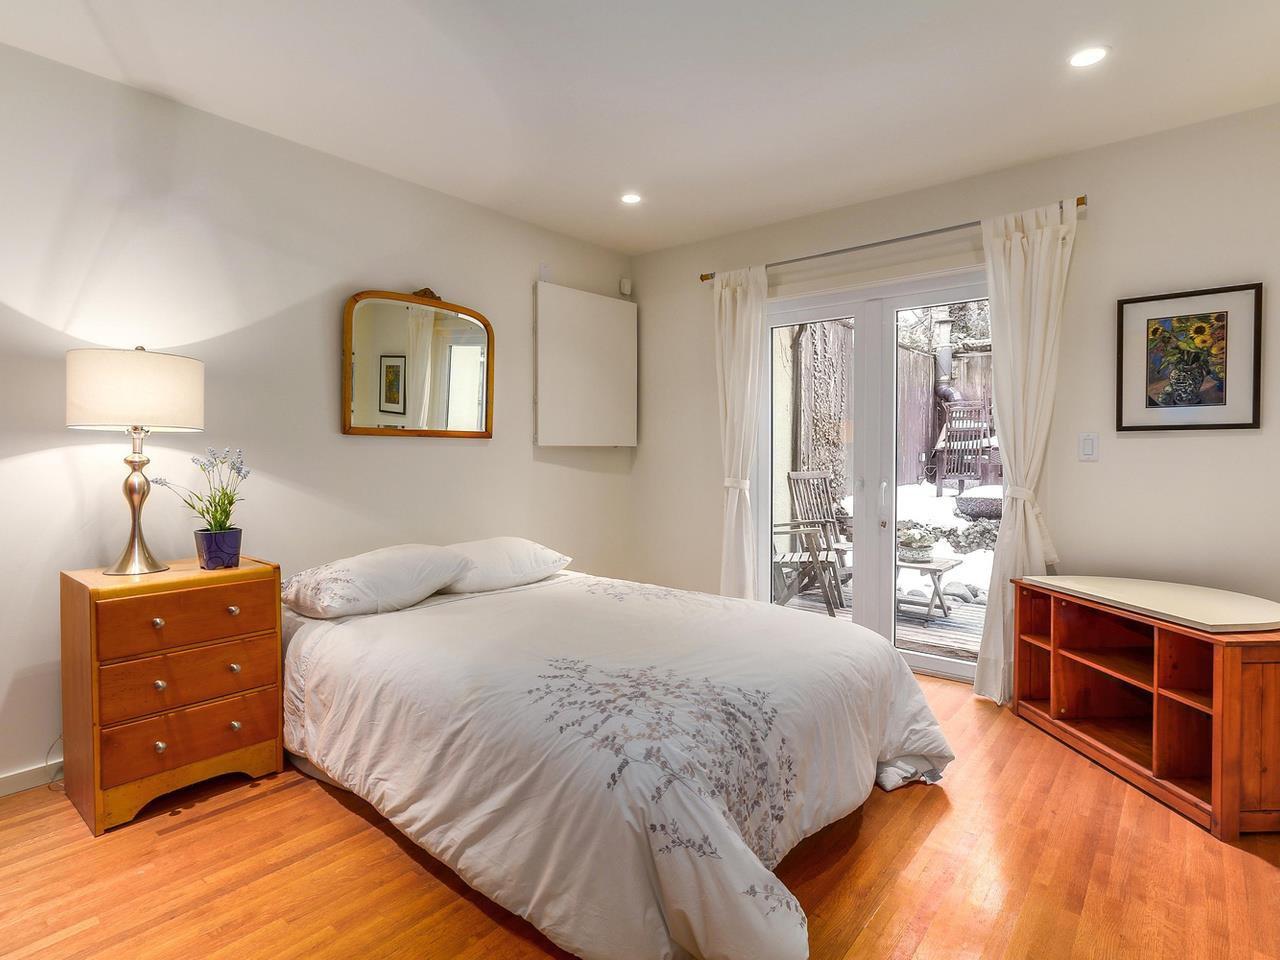 Photo 13: Photos: 3708 EDGEMONT Boulevard in North Vancouver: Edgemont House Fourplex for sale : MLS®# R2138514